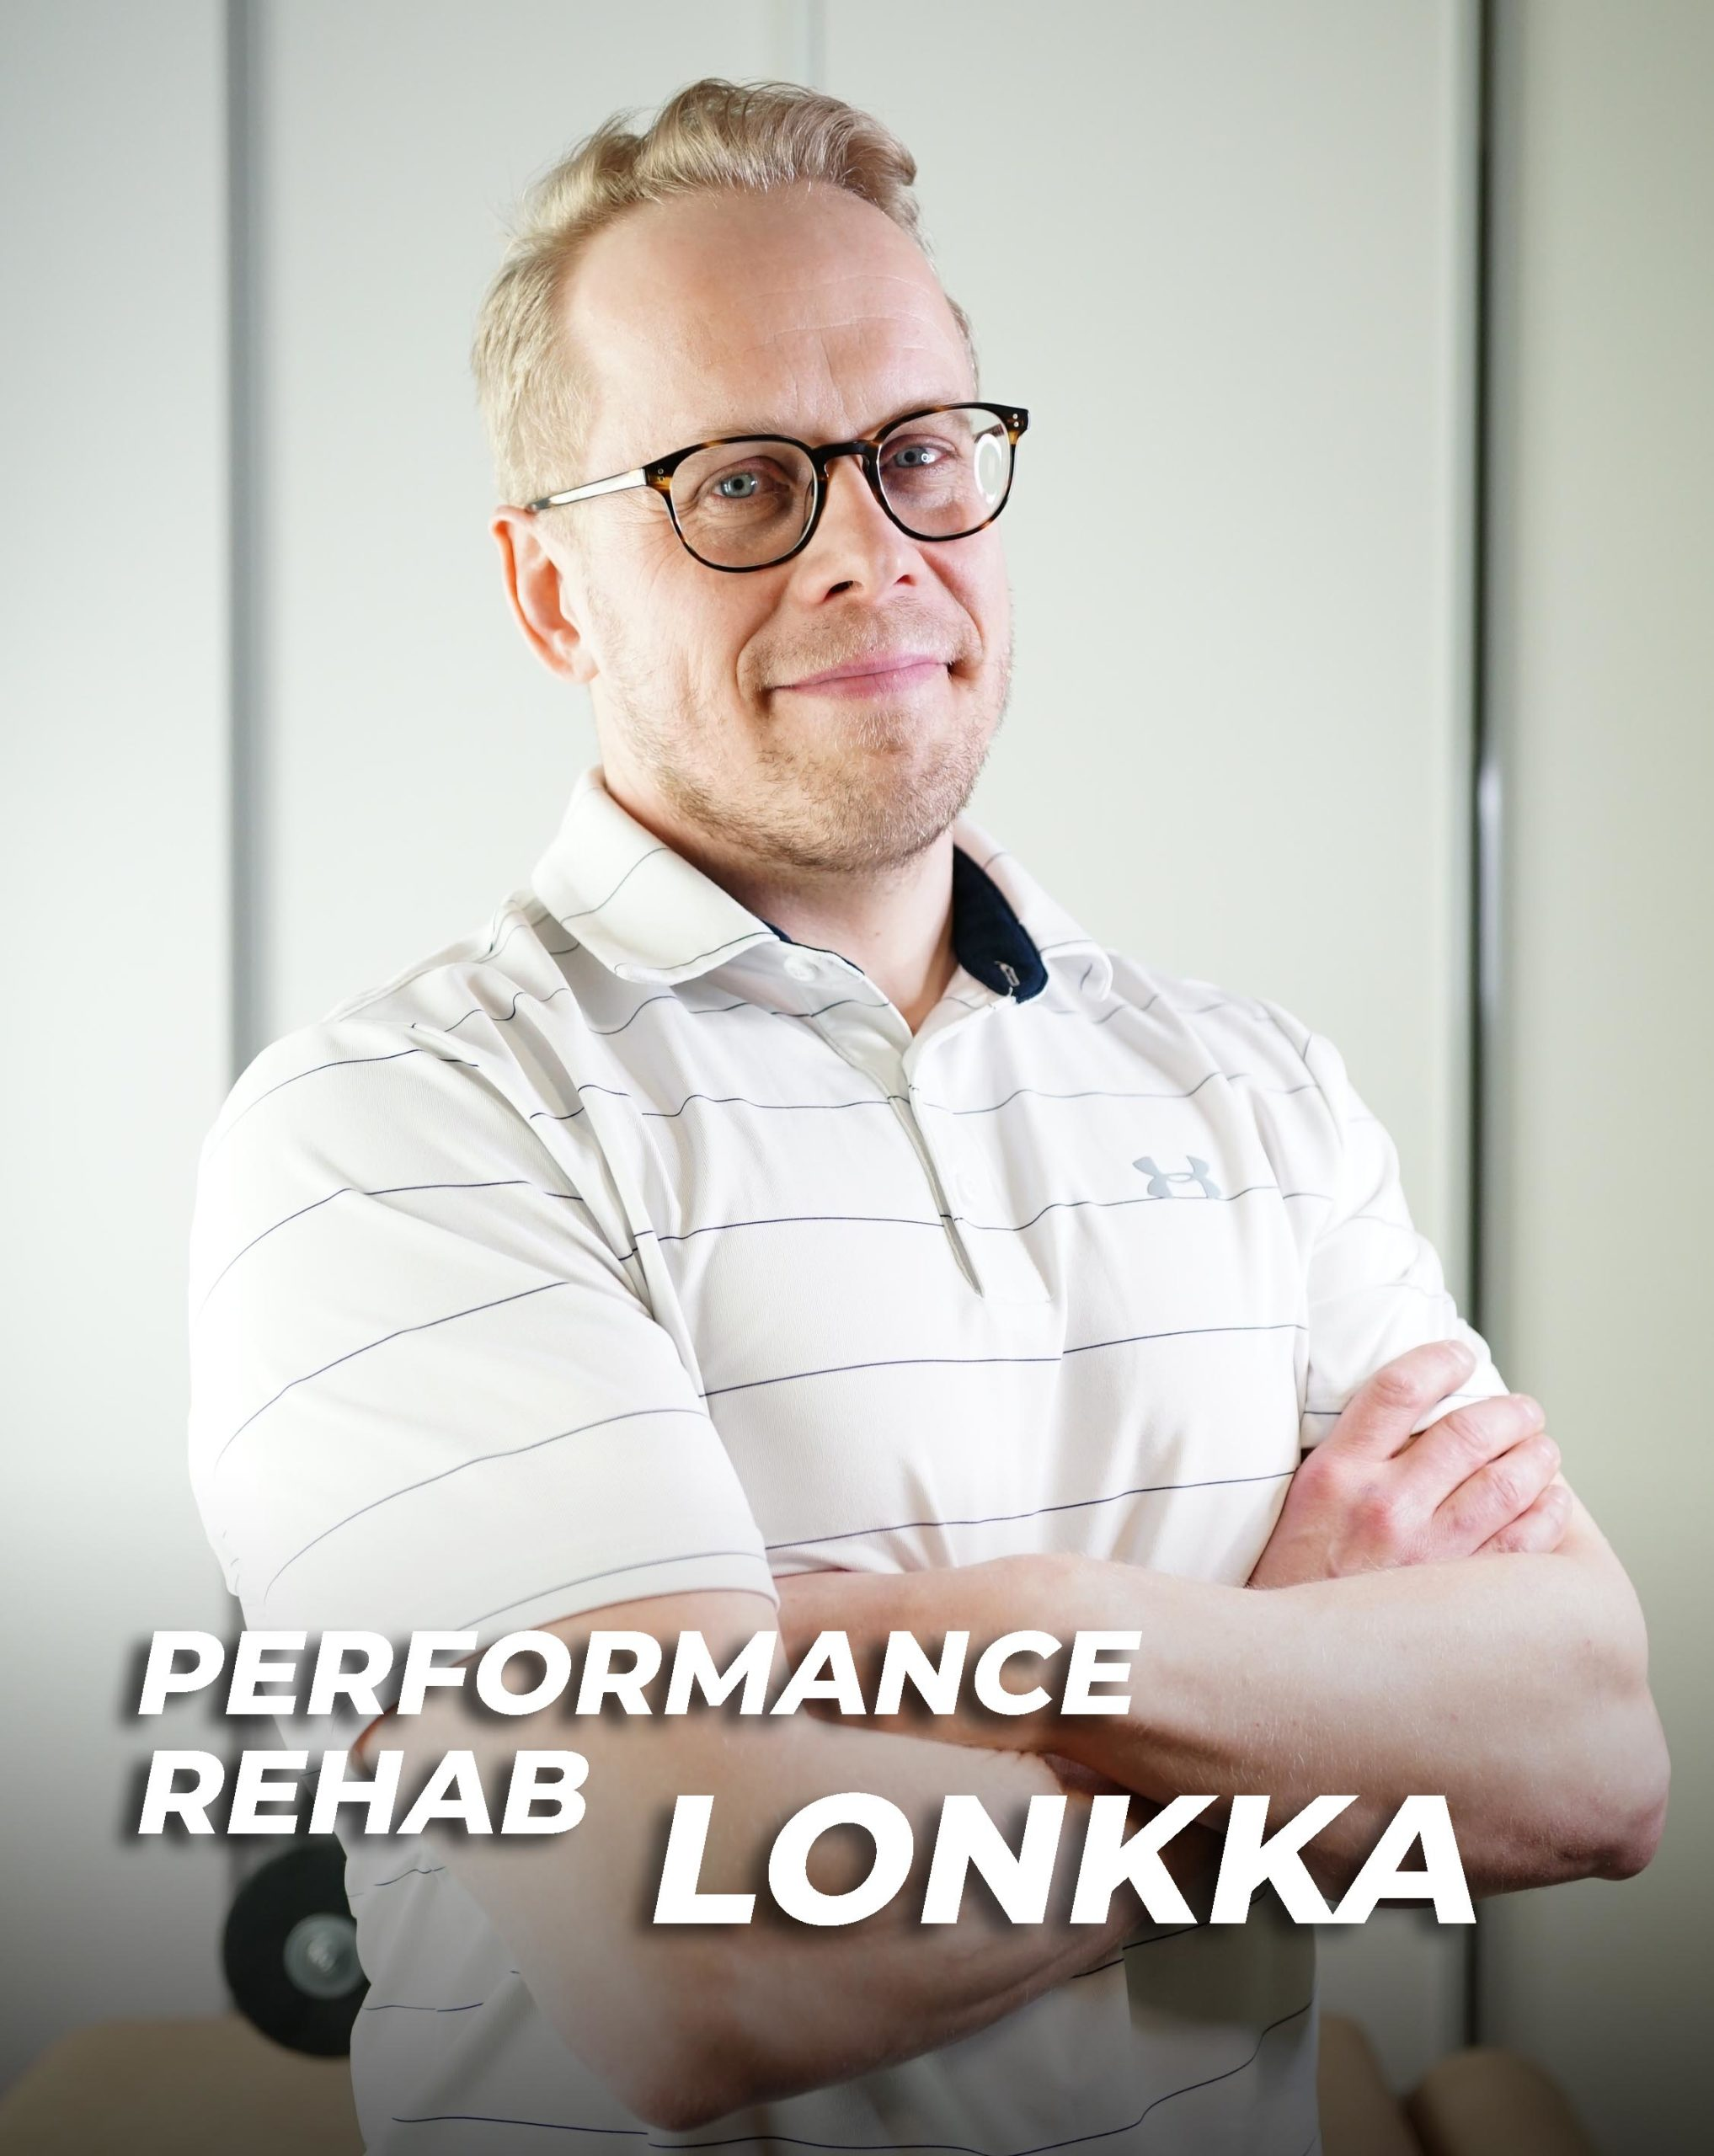 Performance Rehab Lonkka